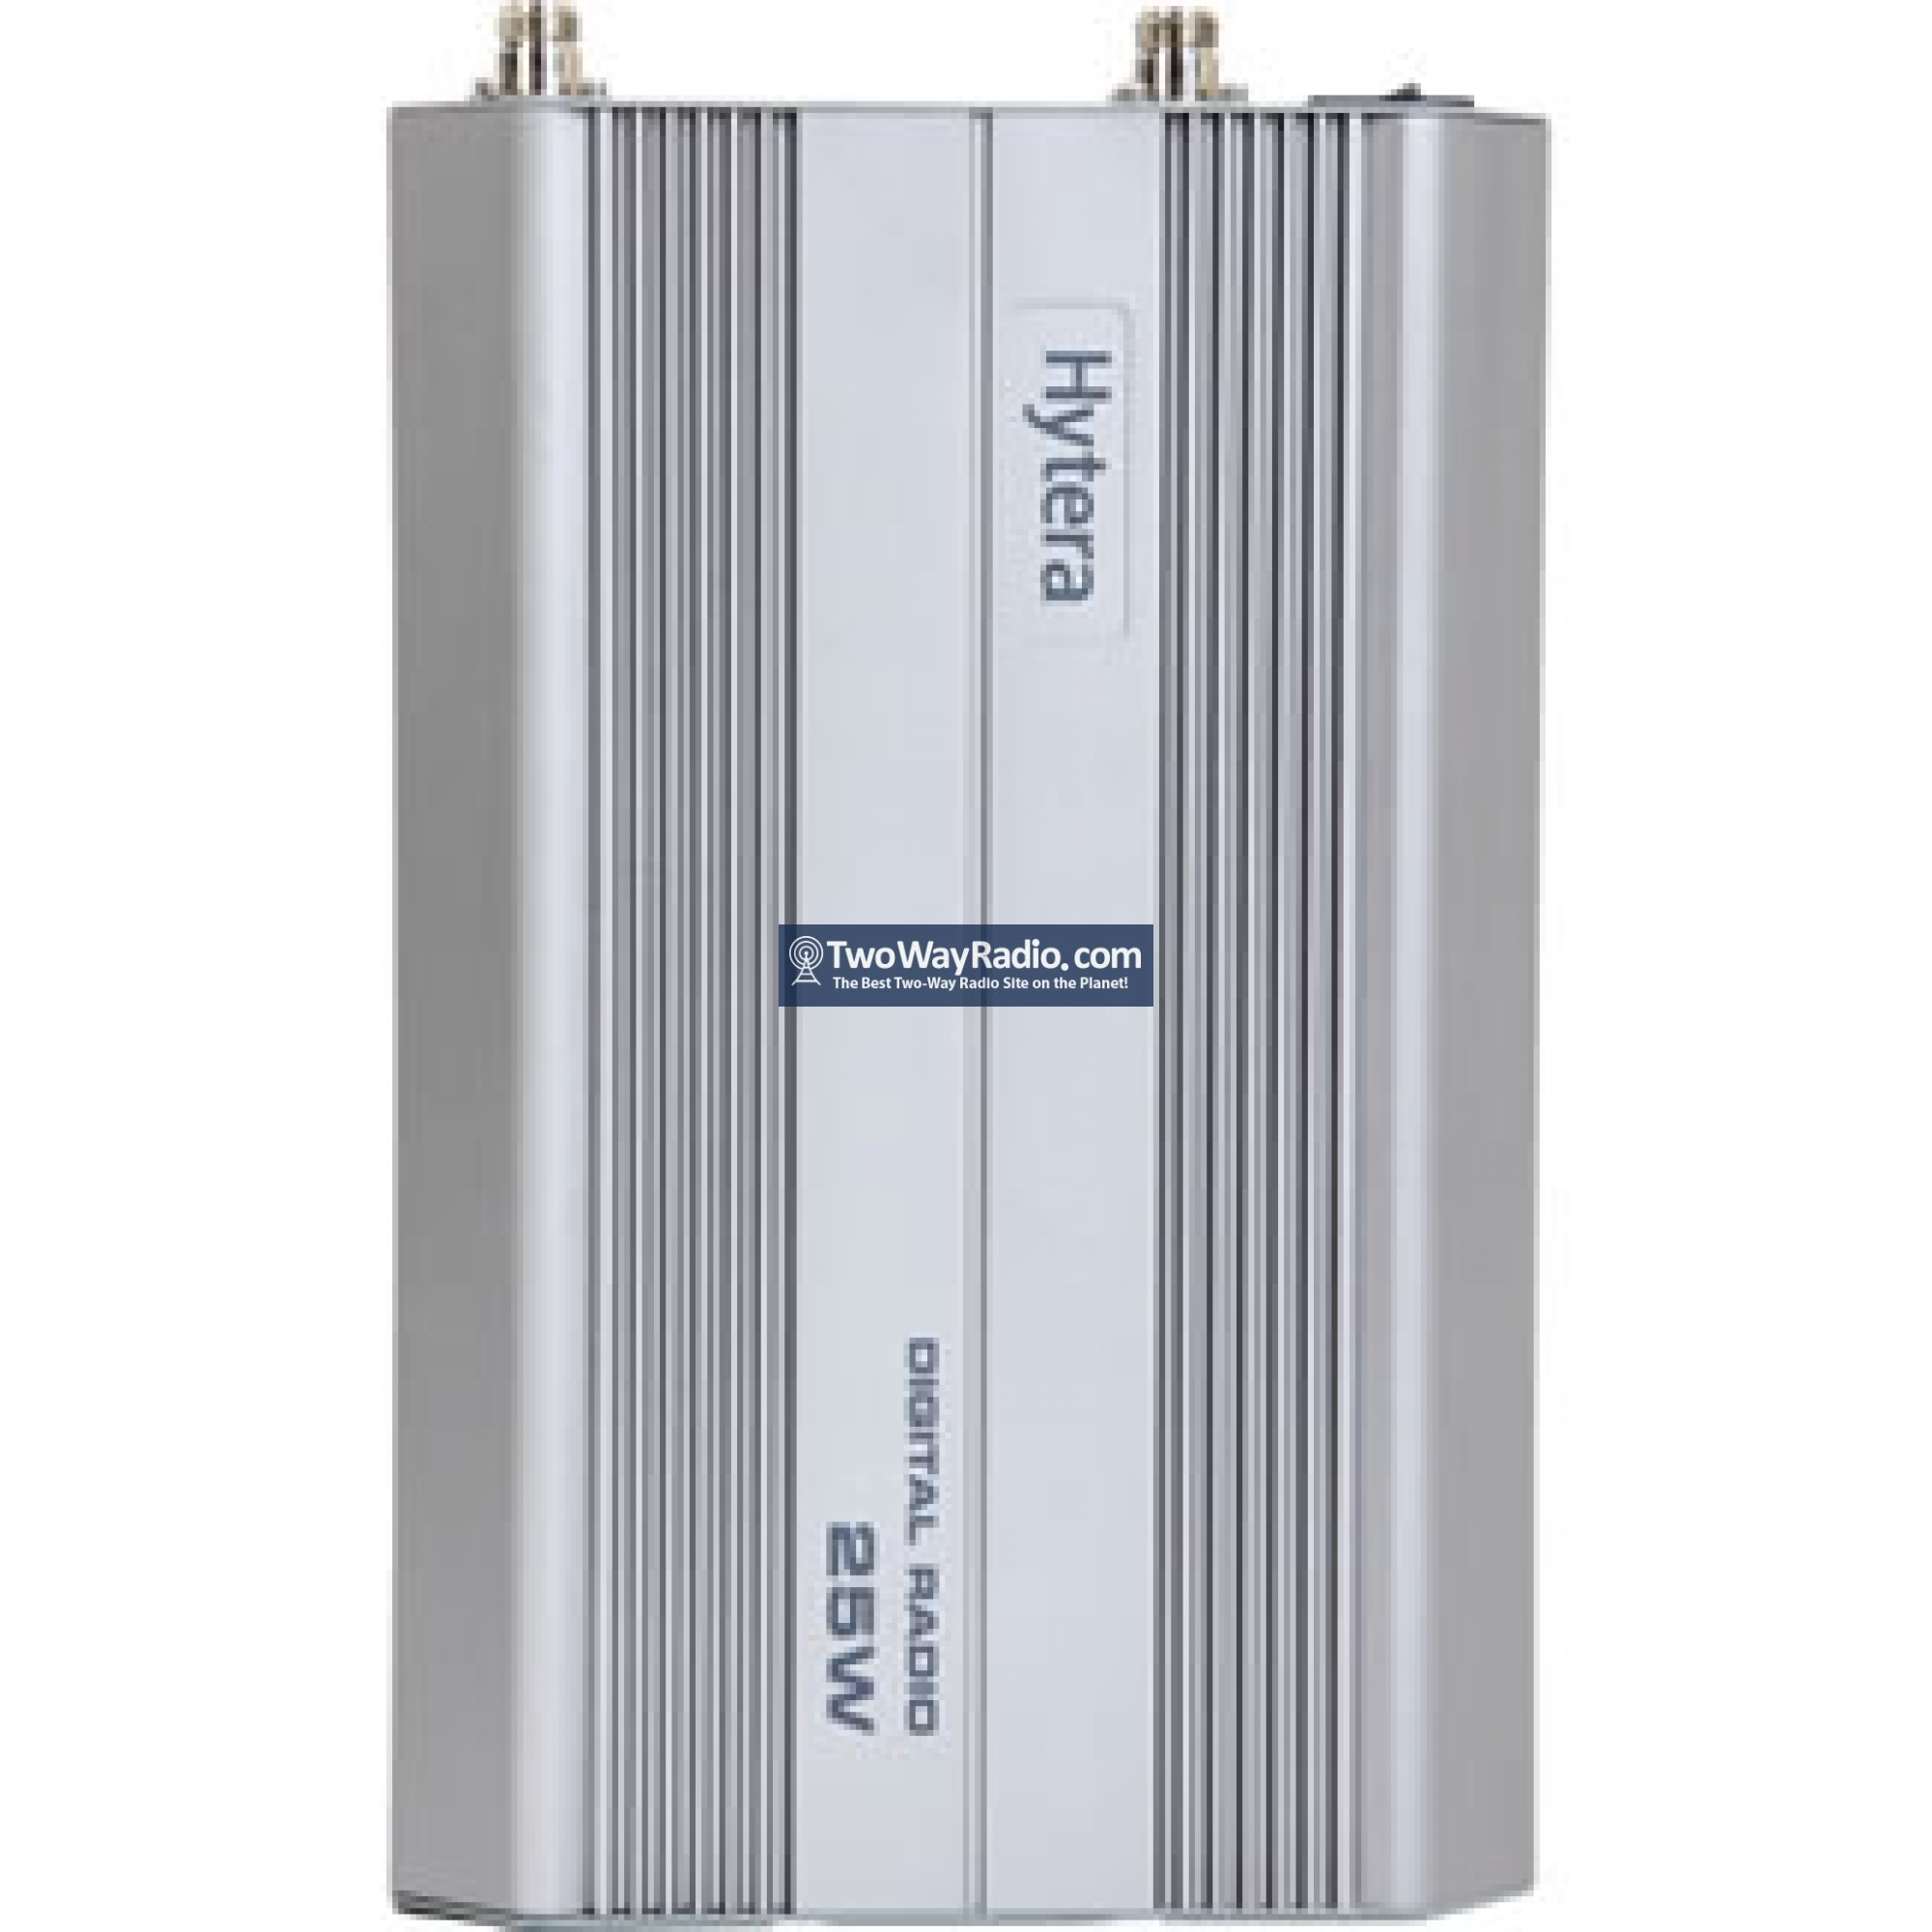 Buy Here | Hytera RD622i U1 Repeater - 2C, 25W, Analog/Digital DMR